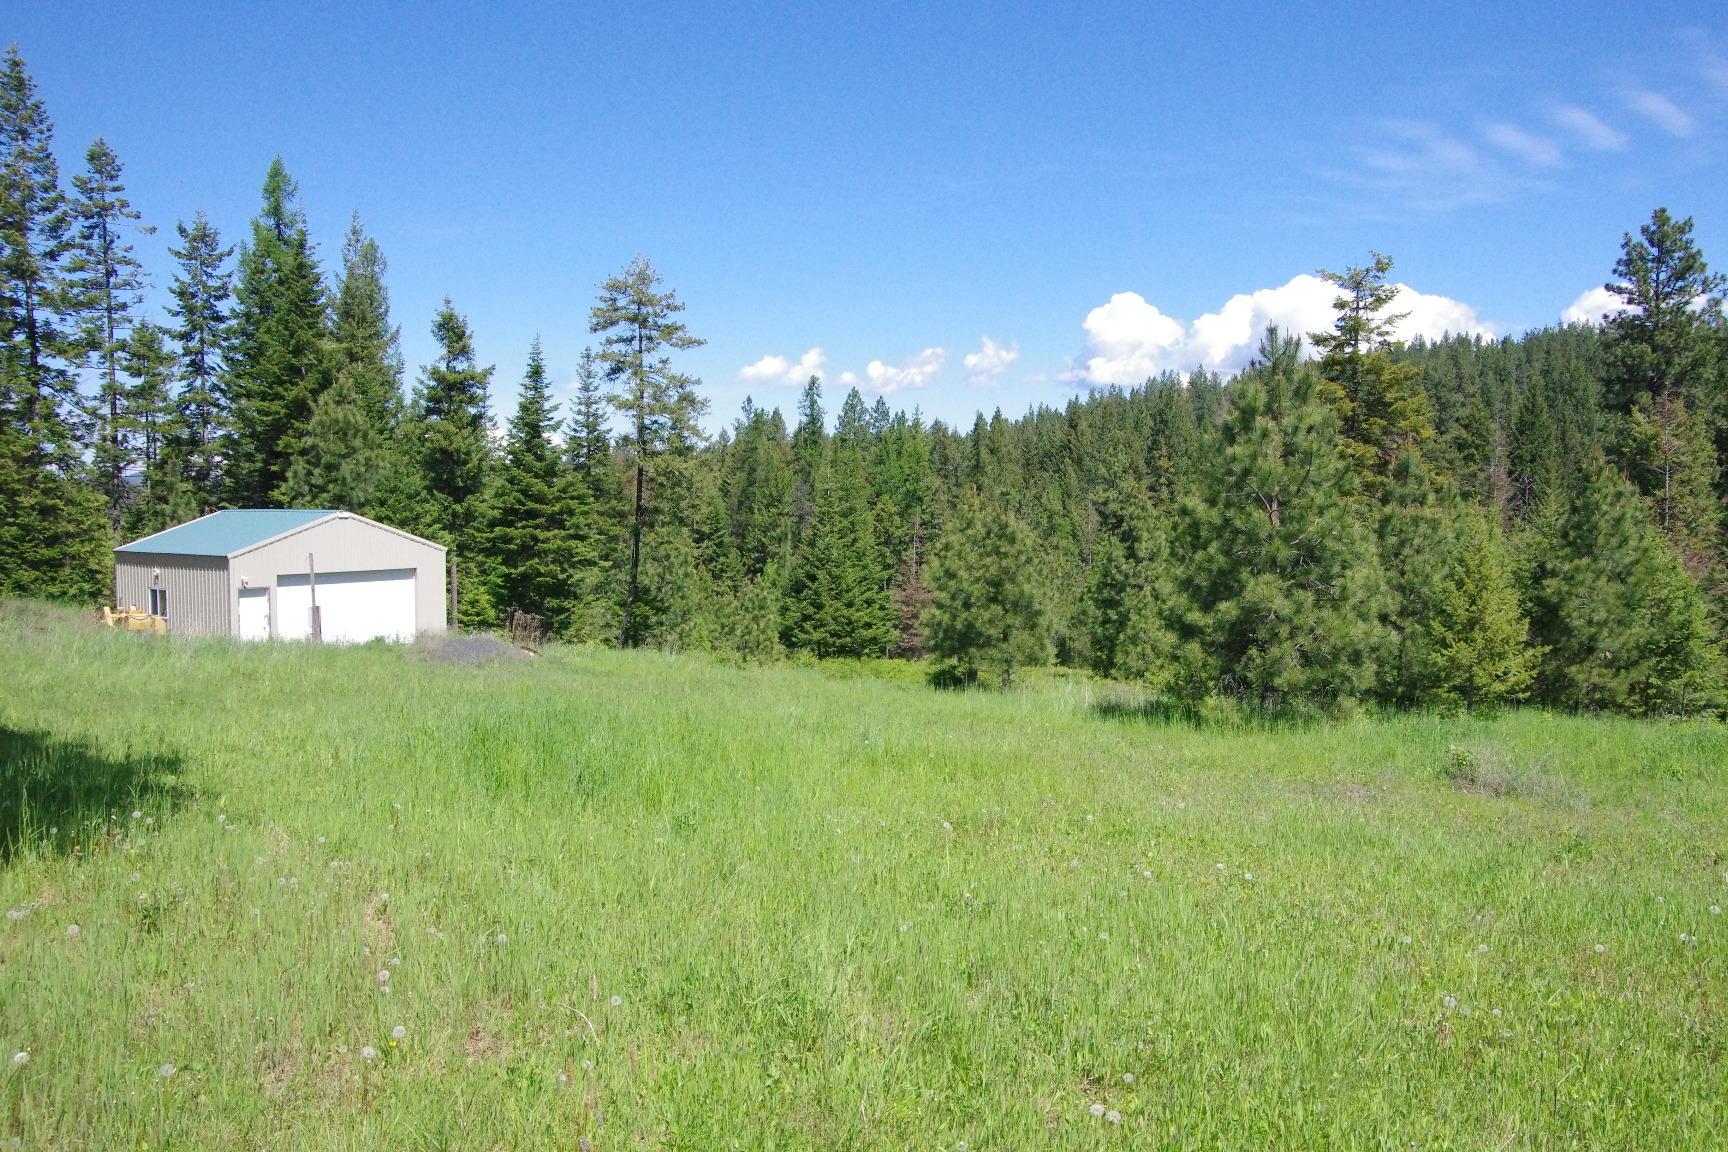 photo of E Wood Duck Ln St. Maries Idaho 83861